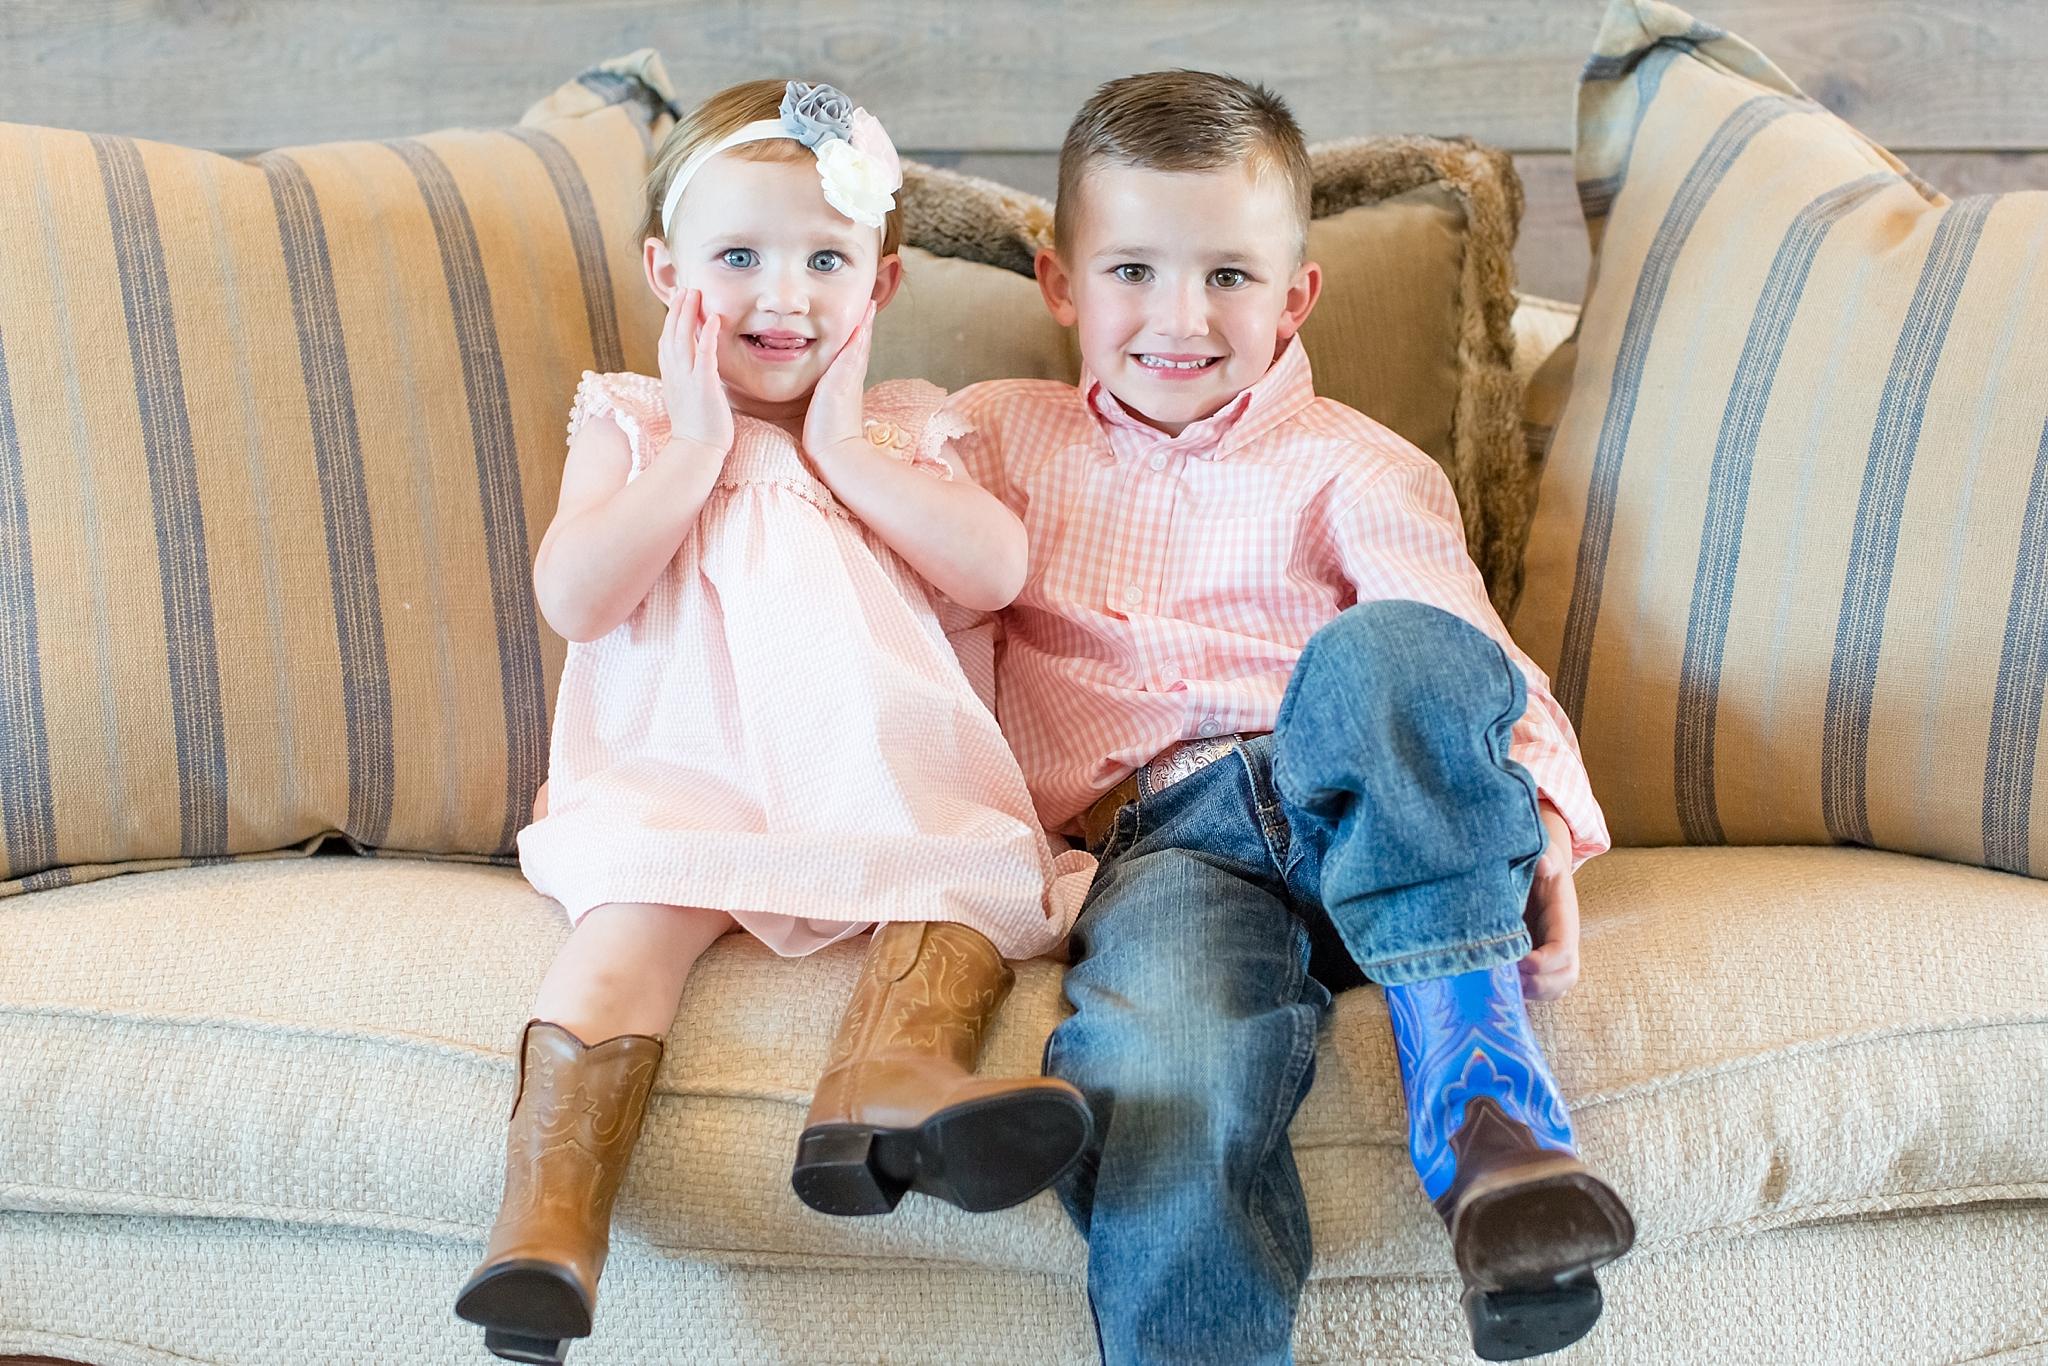 Landon-Schneider-Photography-Family-Session-Texas_0001.jpg